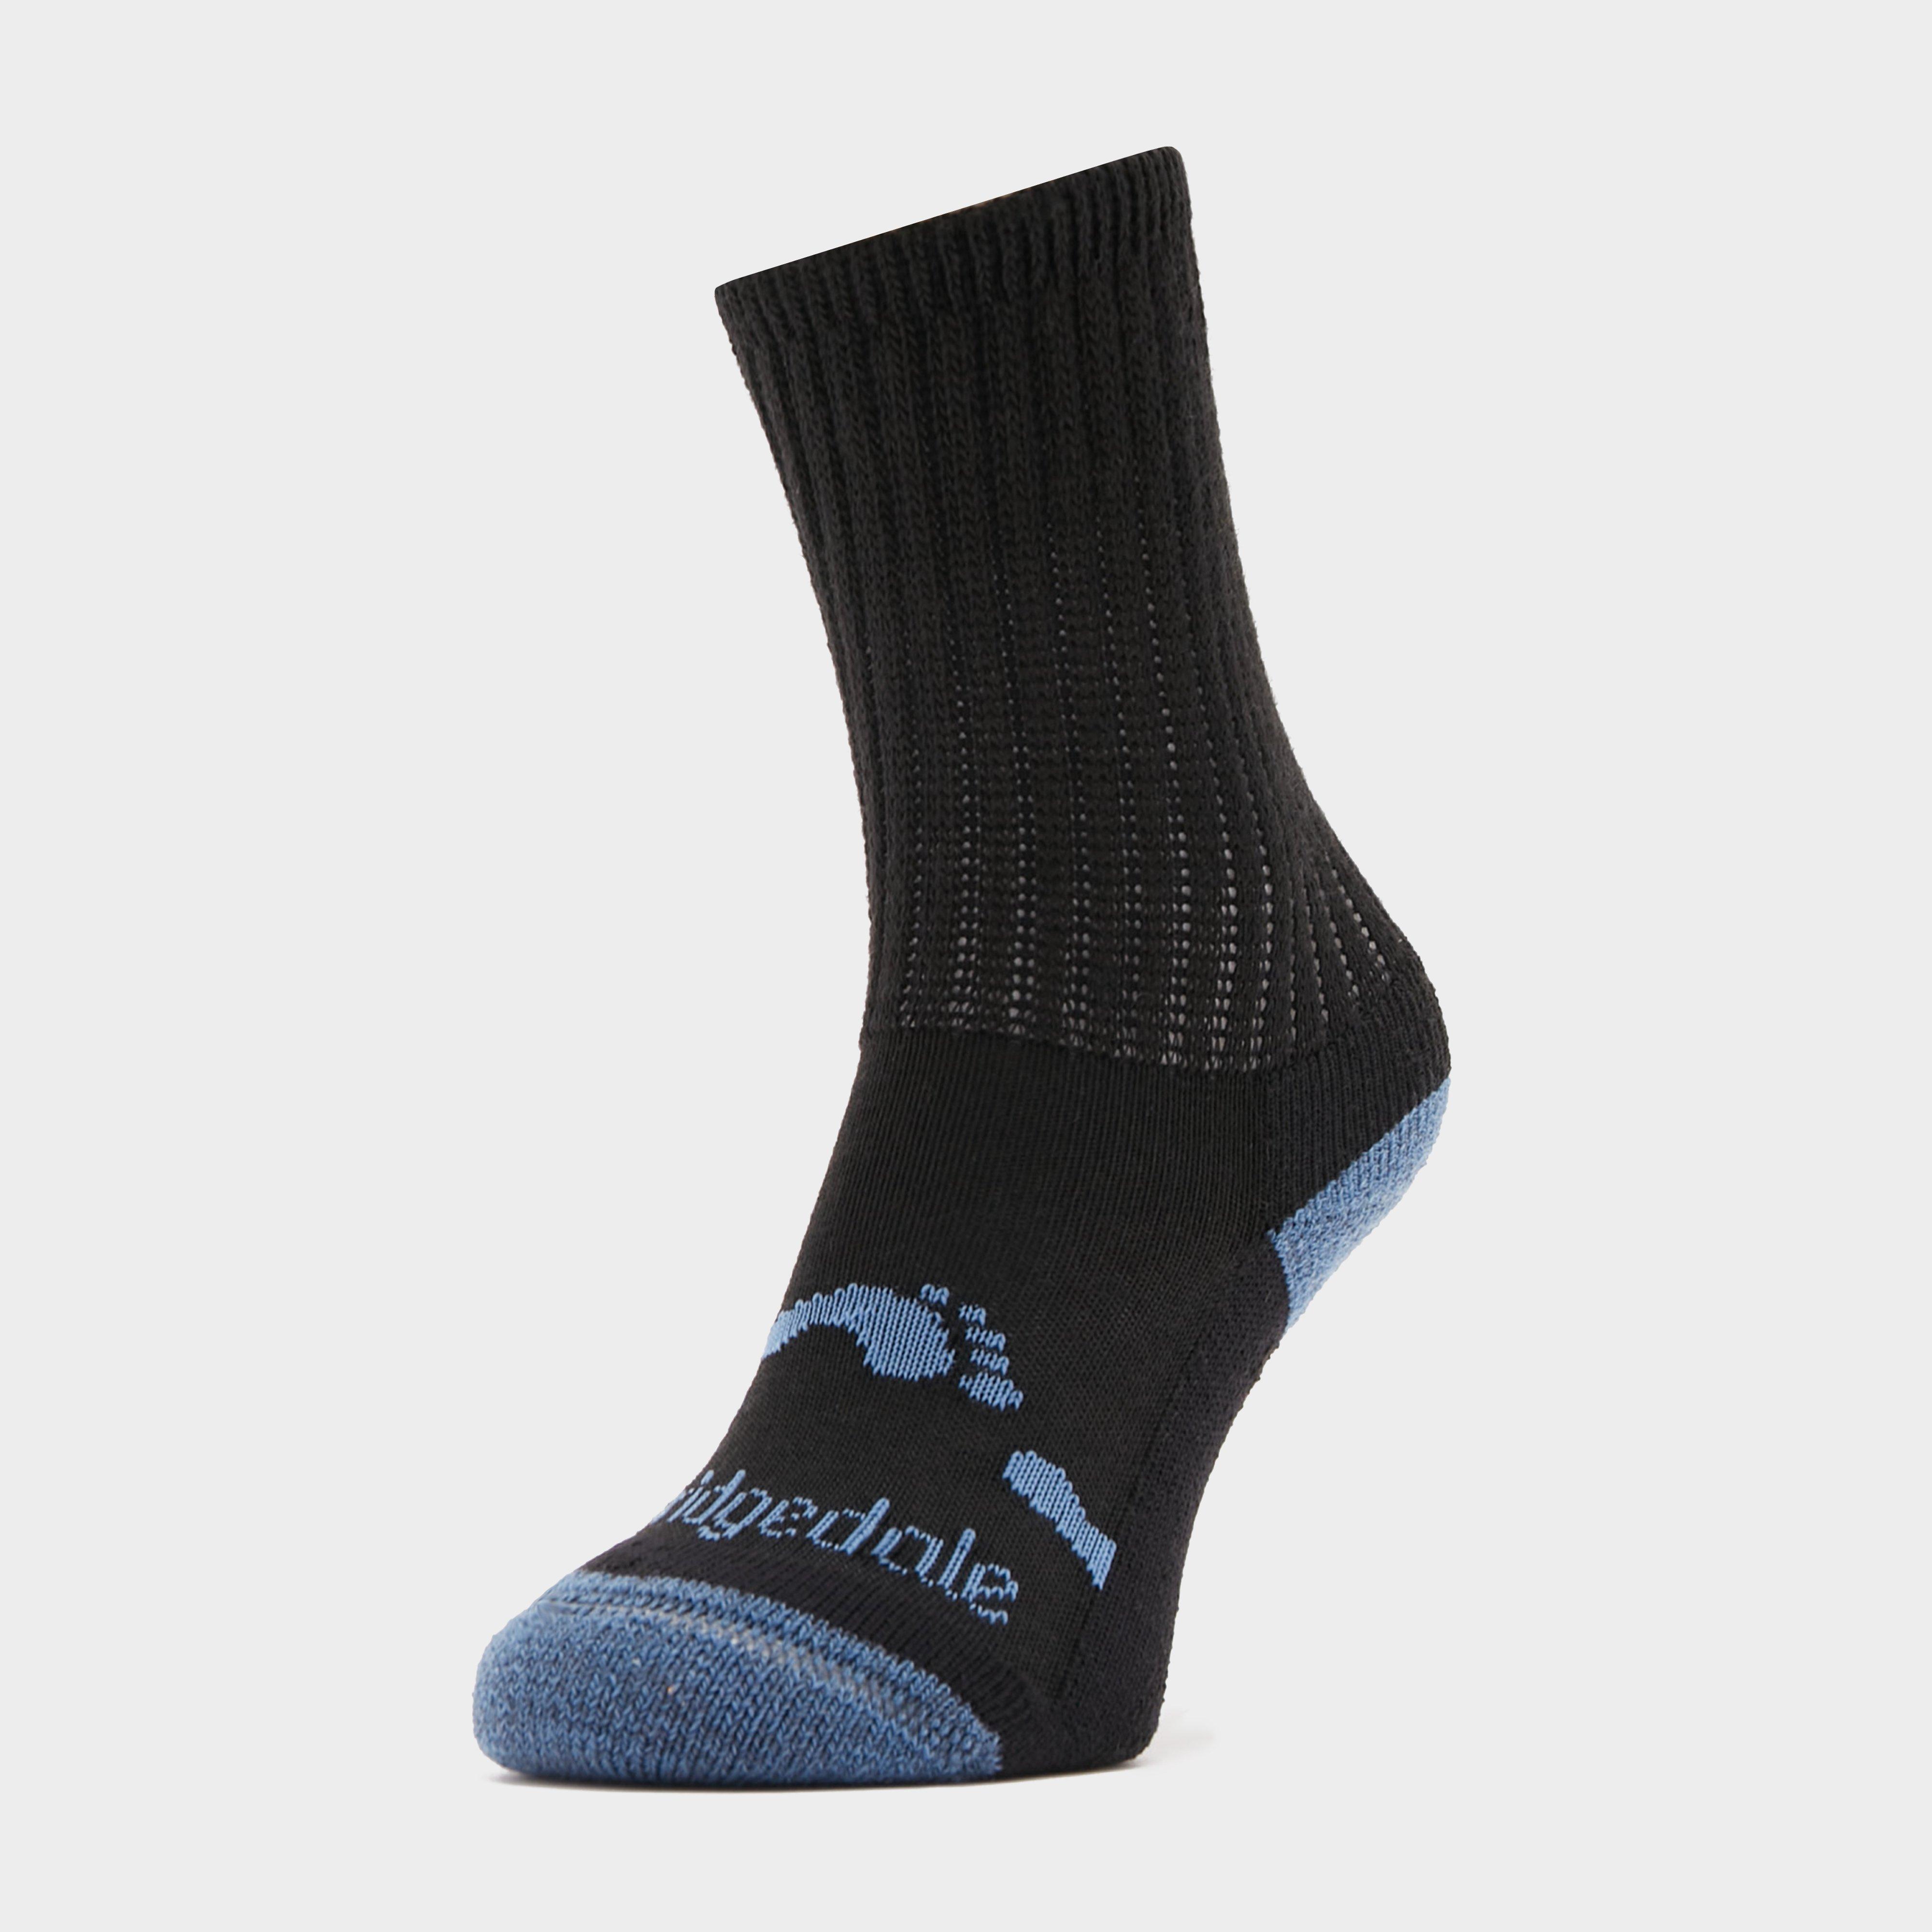 Berghaus Womens Ortler 2.0 Trousers - Black  Black